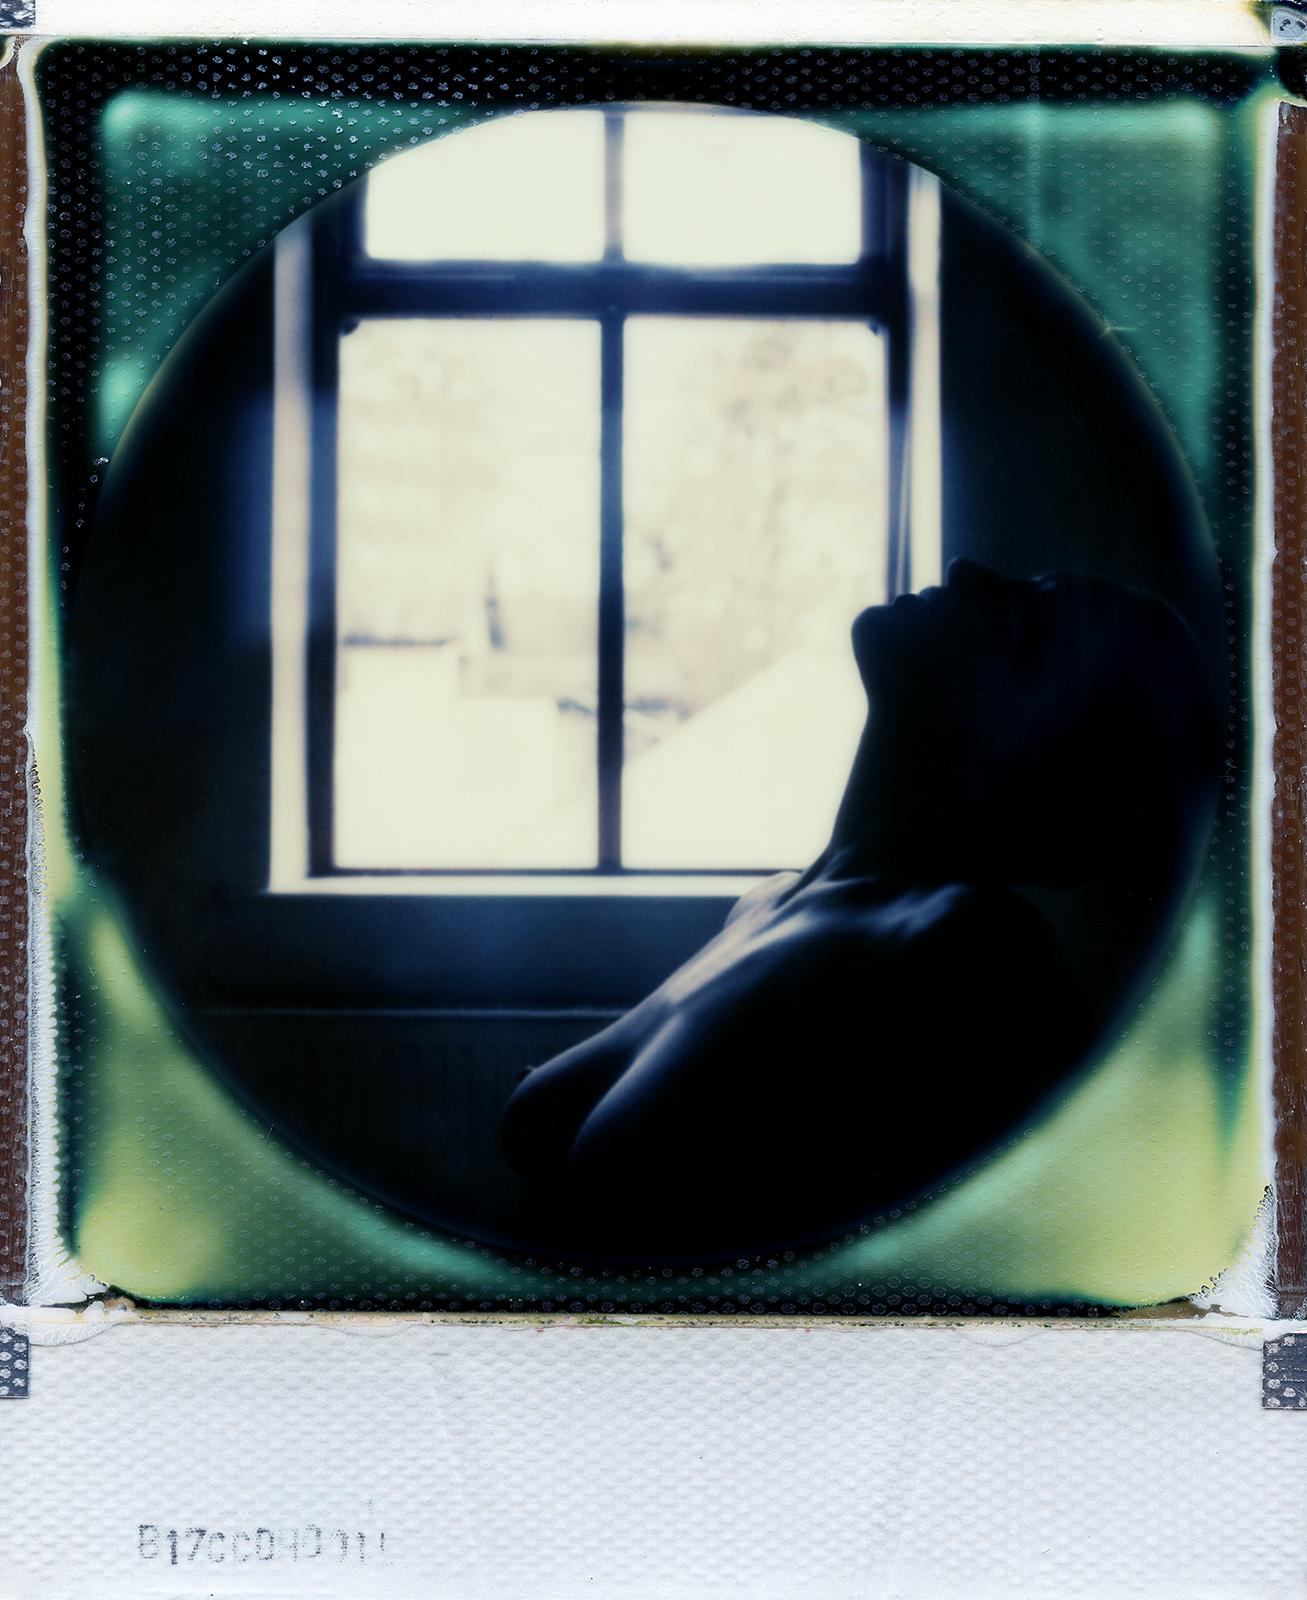 Still | Polaroid SX70 | Impossible Project 70 Color Round Frame | Dee Elegia | @iamelegia